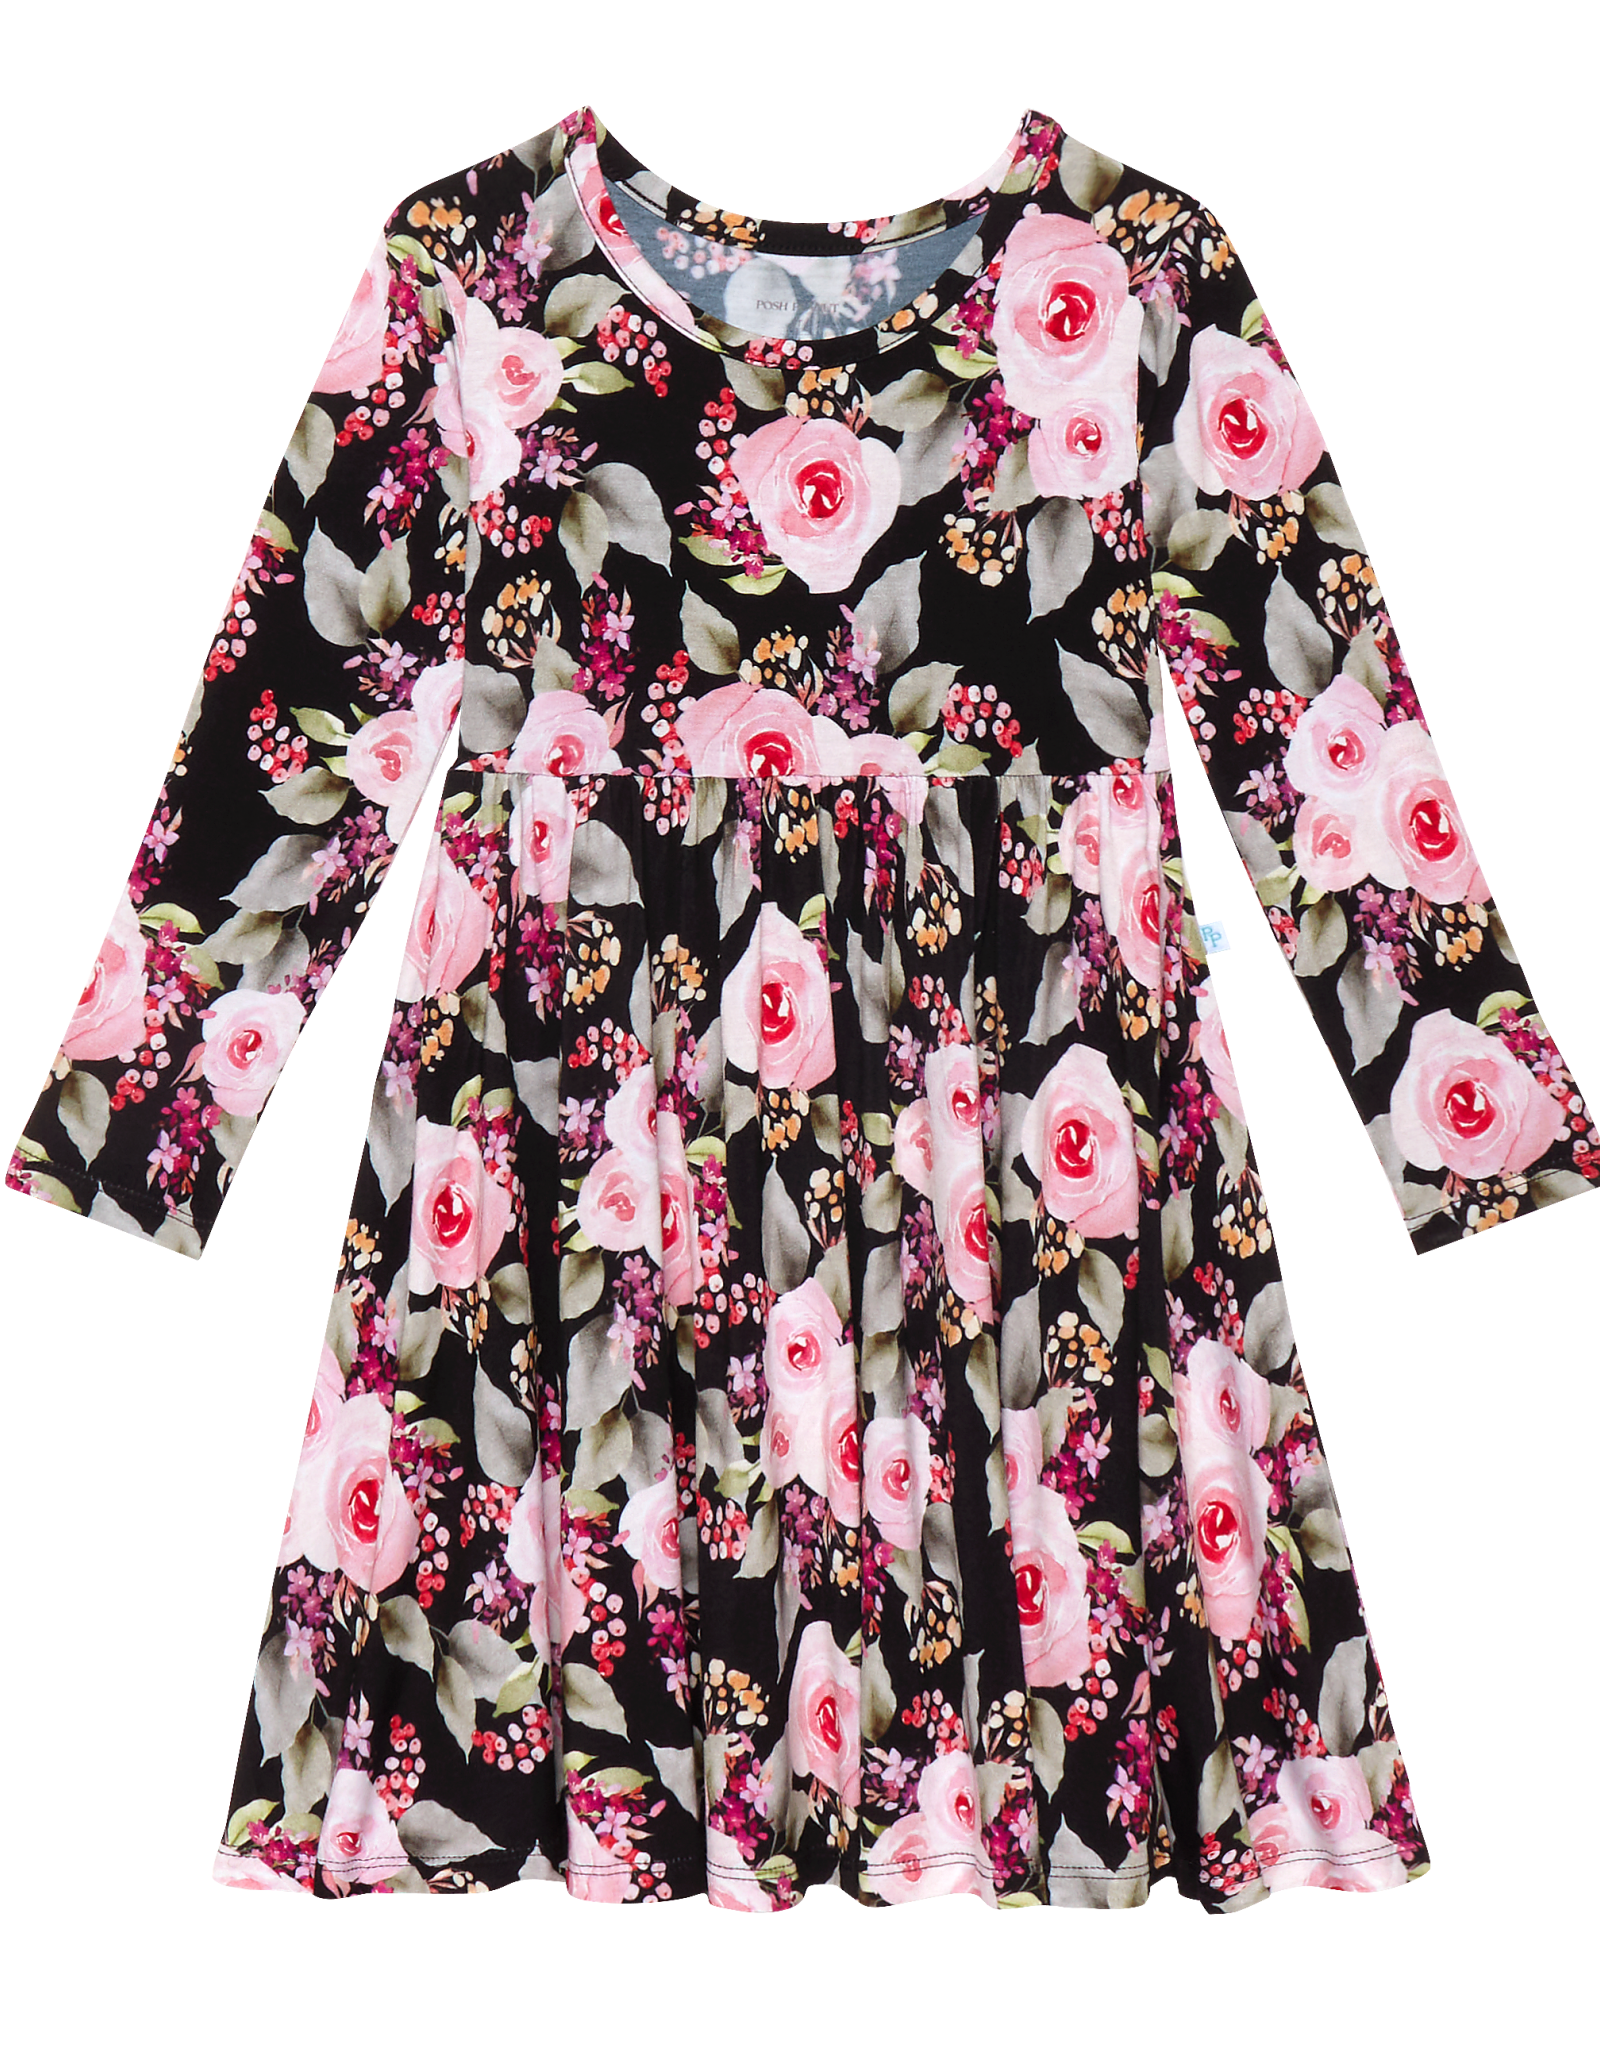 POSH PEANUT MILANA LONG SLEEVE TWIRL DRESS